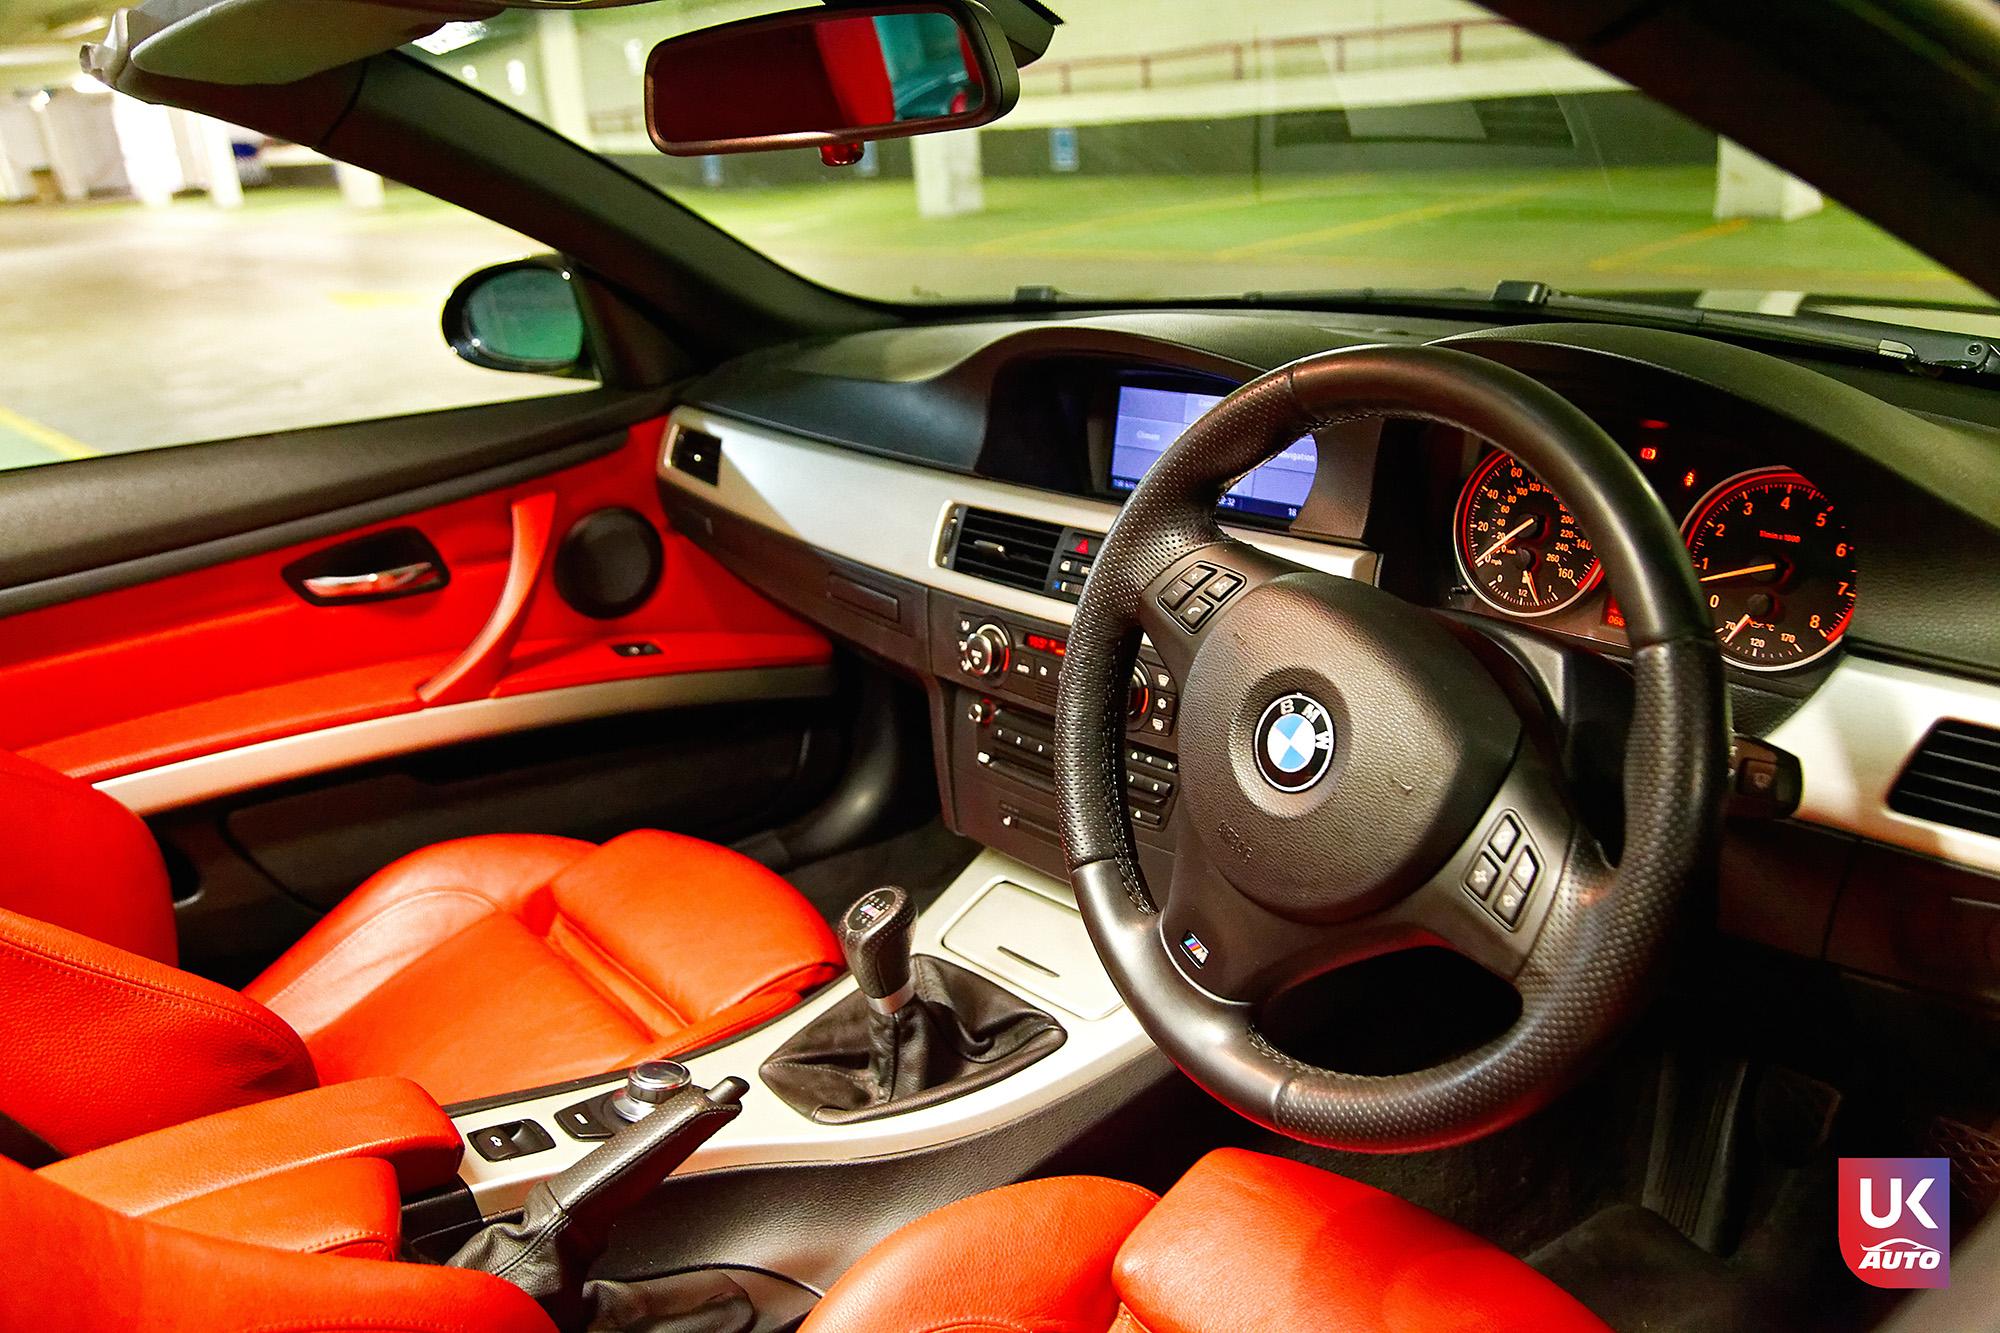 UKAUTO IMPORT ANGLETERRE BMW 335i CABRIOLET UKA RHD41 - Felecitation a Jeremie pour cette BMW 335i cabriolet RHD PACK M IMPORT AUTO ANGLAISE